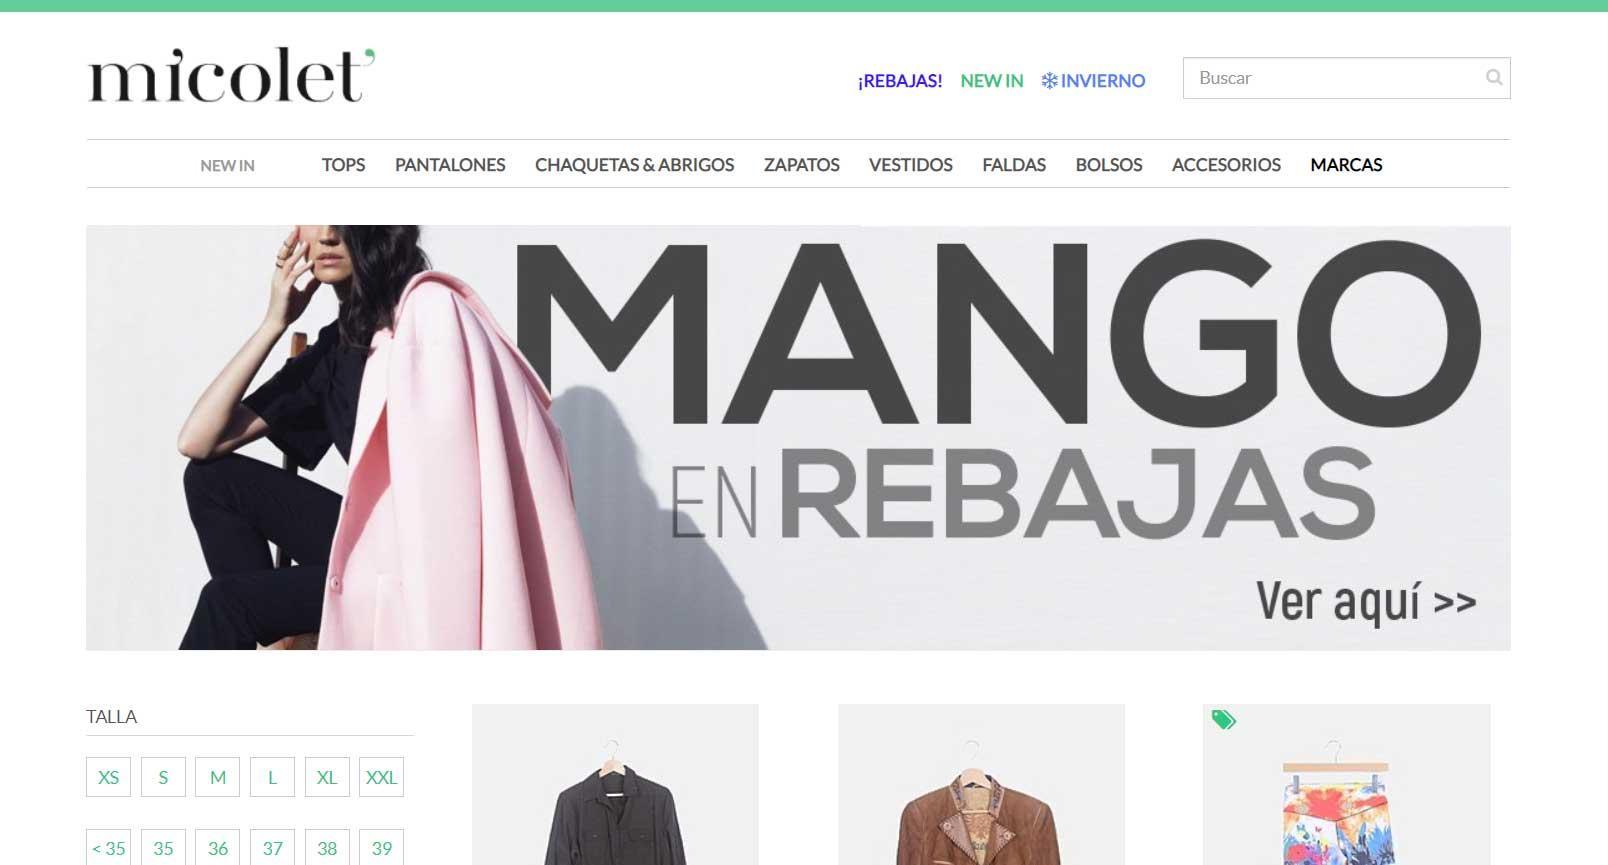 Micolet - Mejores webs para vender ropa